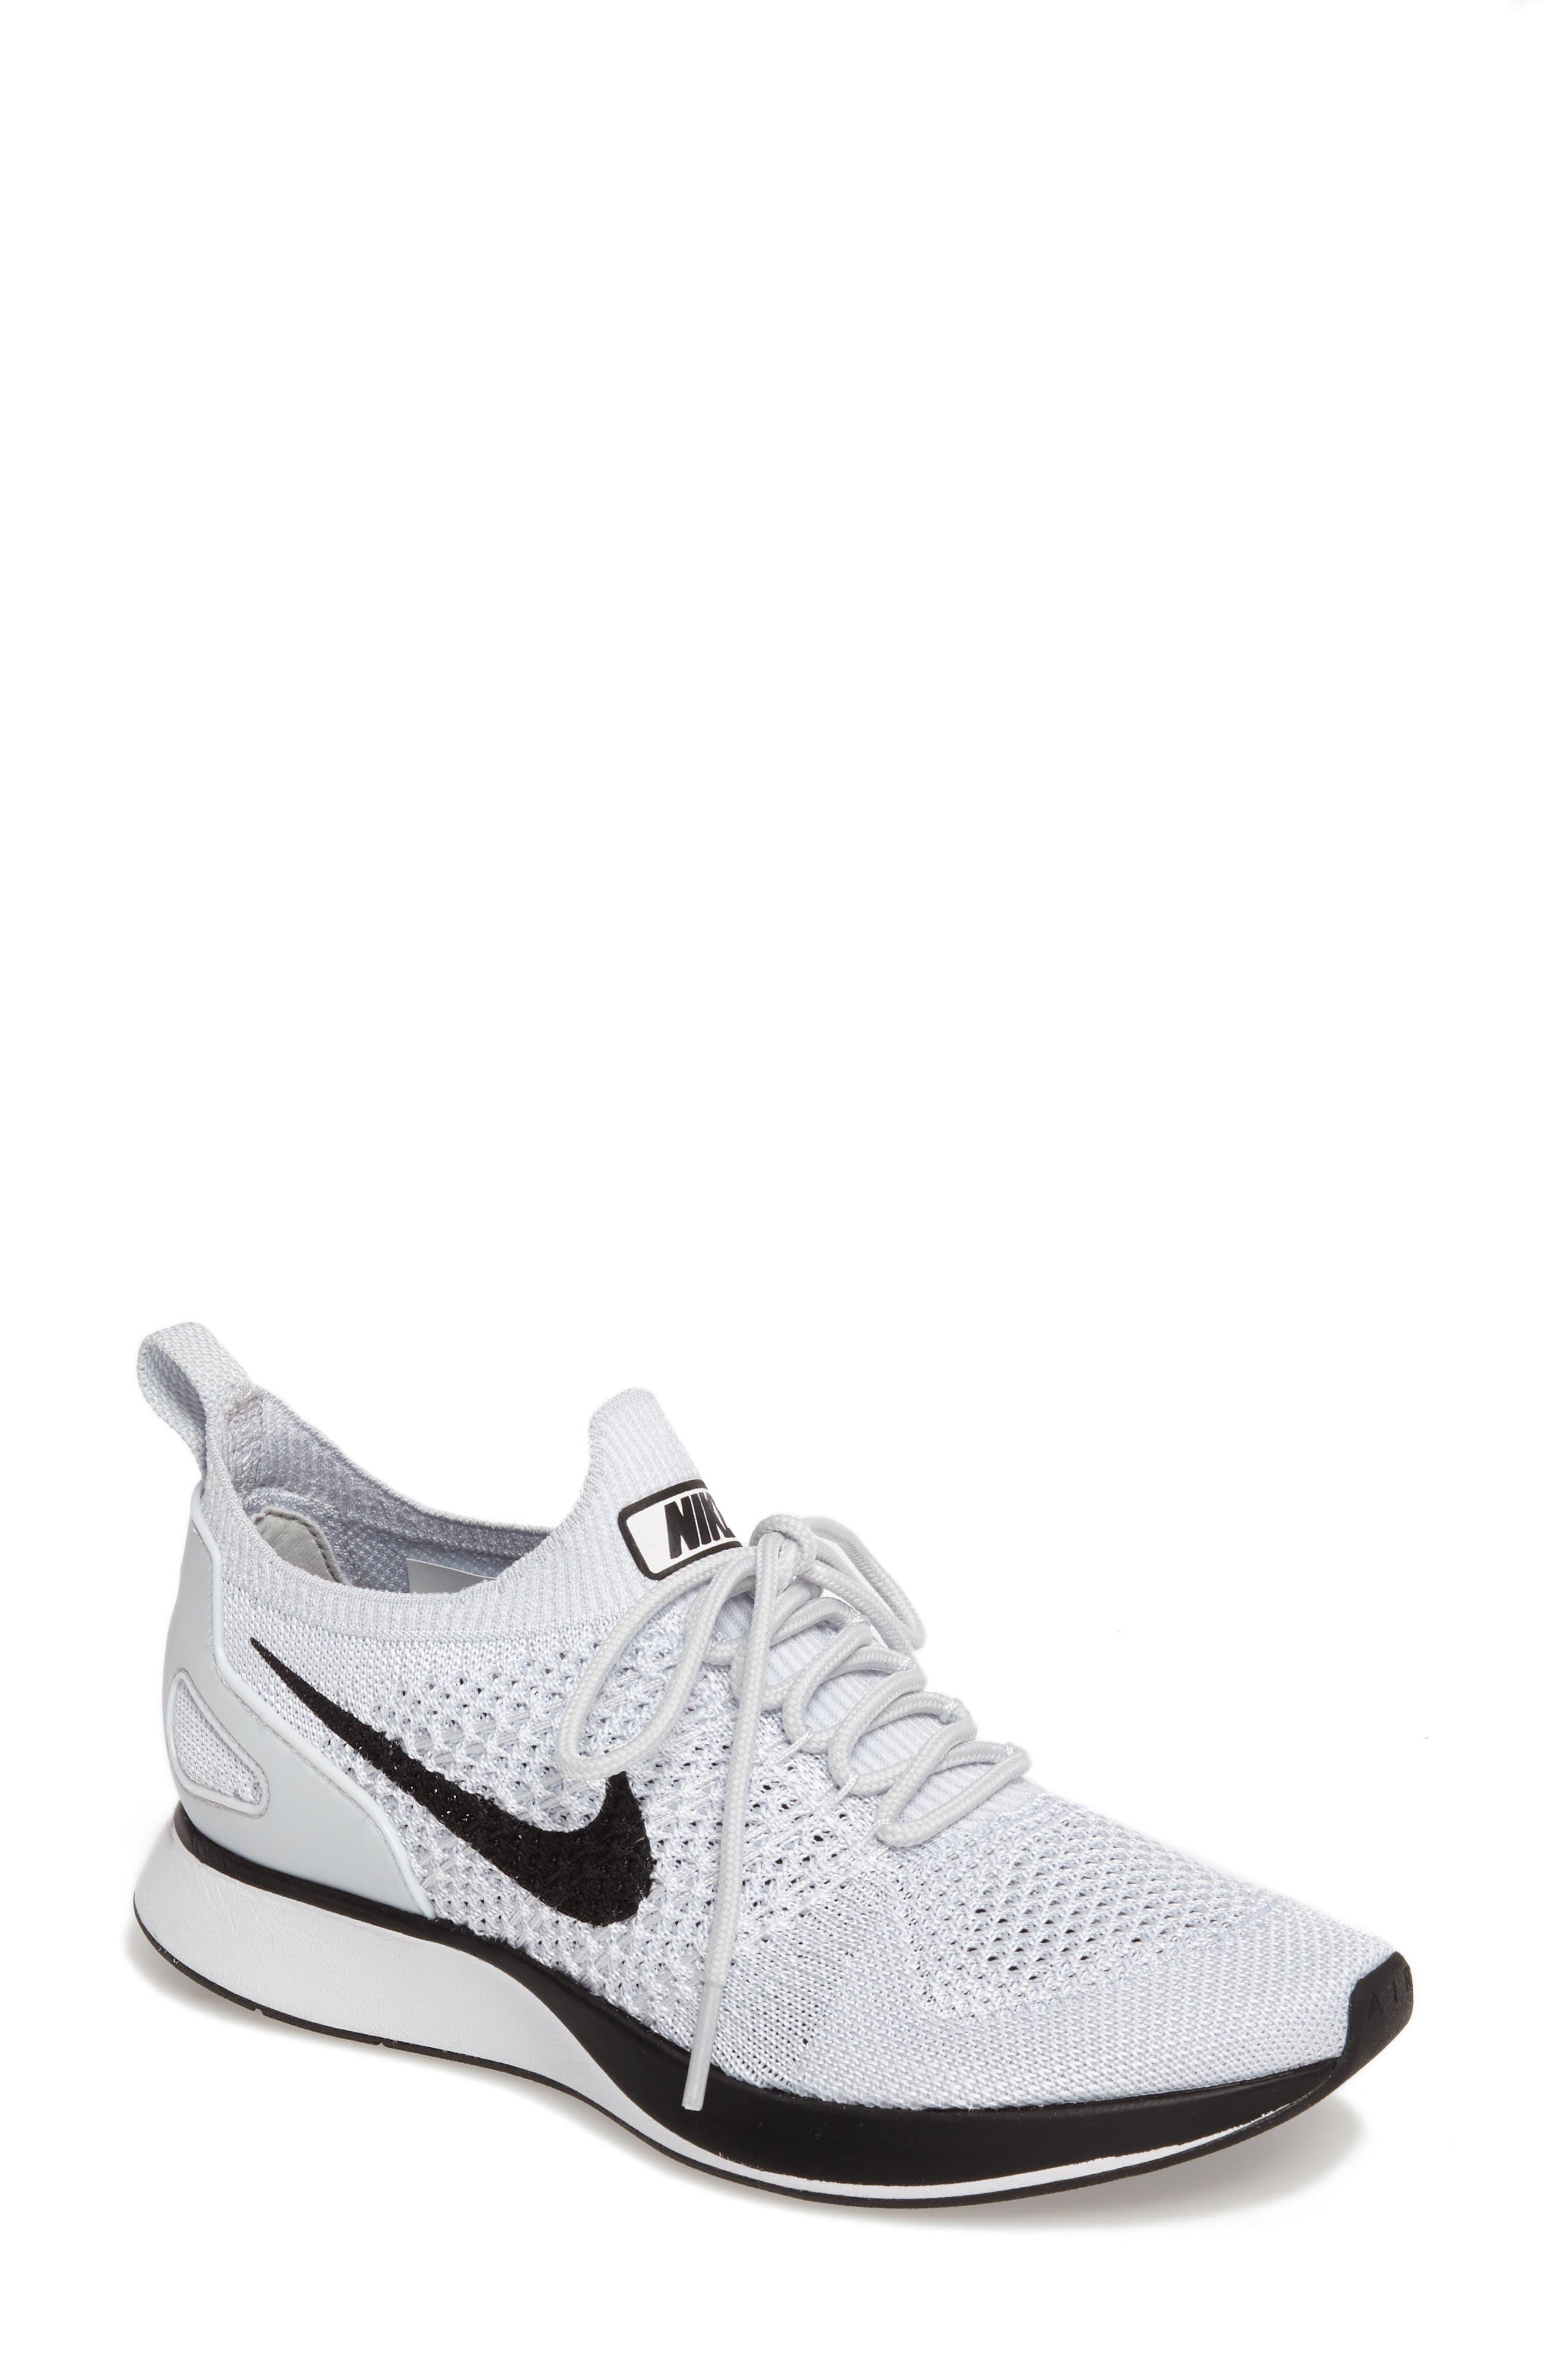 Main Image - Nike Zoom Mariah Flyknit Racer Premium Sneaker (Women)